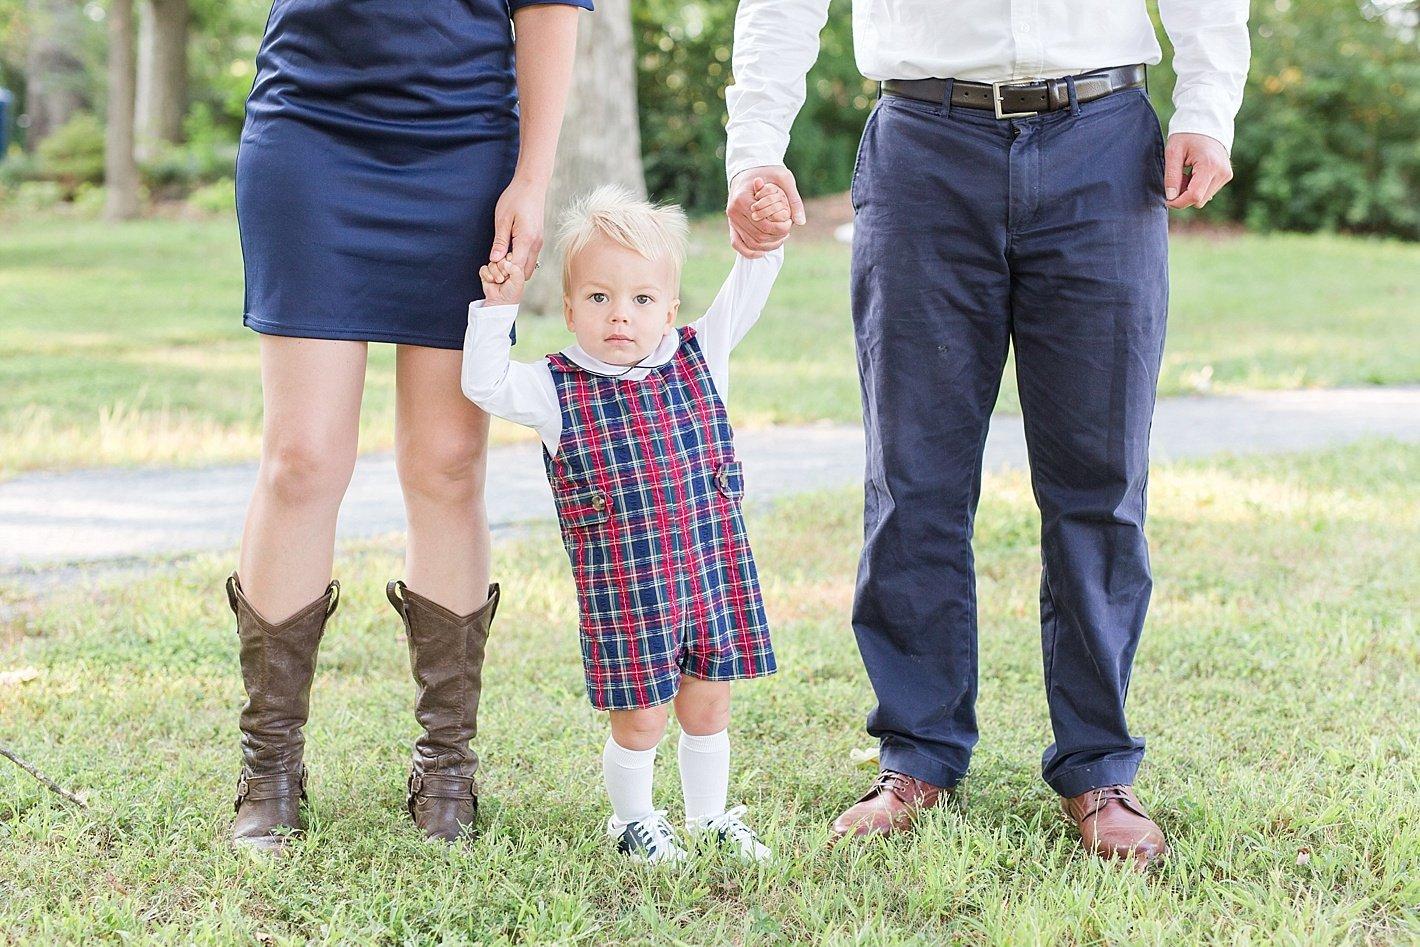 Howard_County_family_photographer_arpasi_photography-17